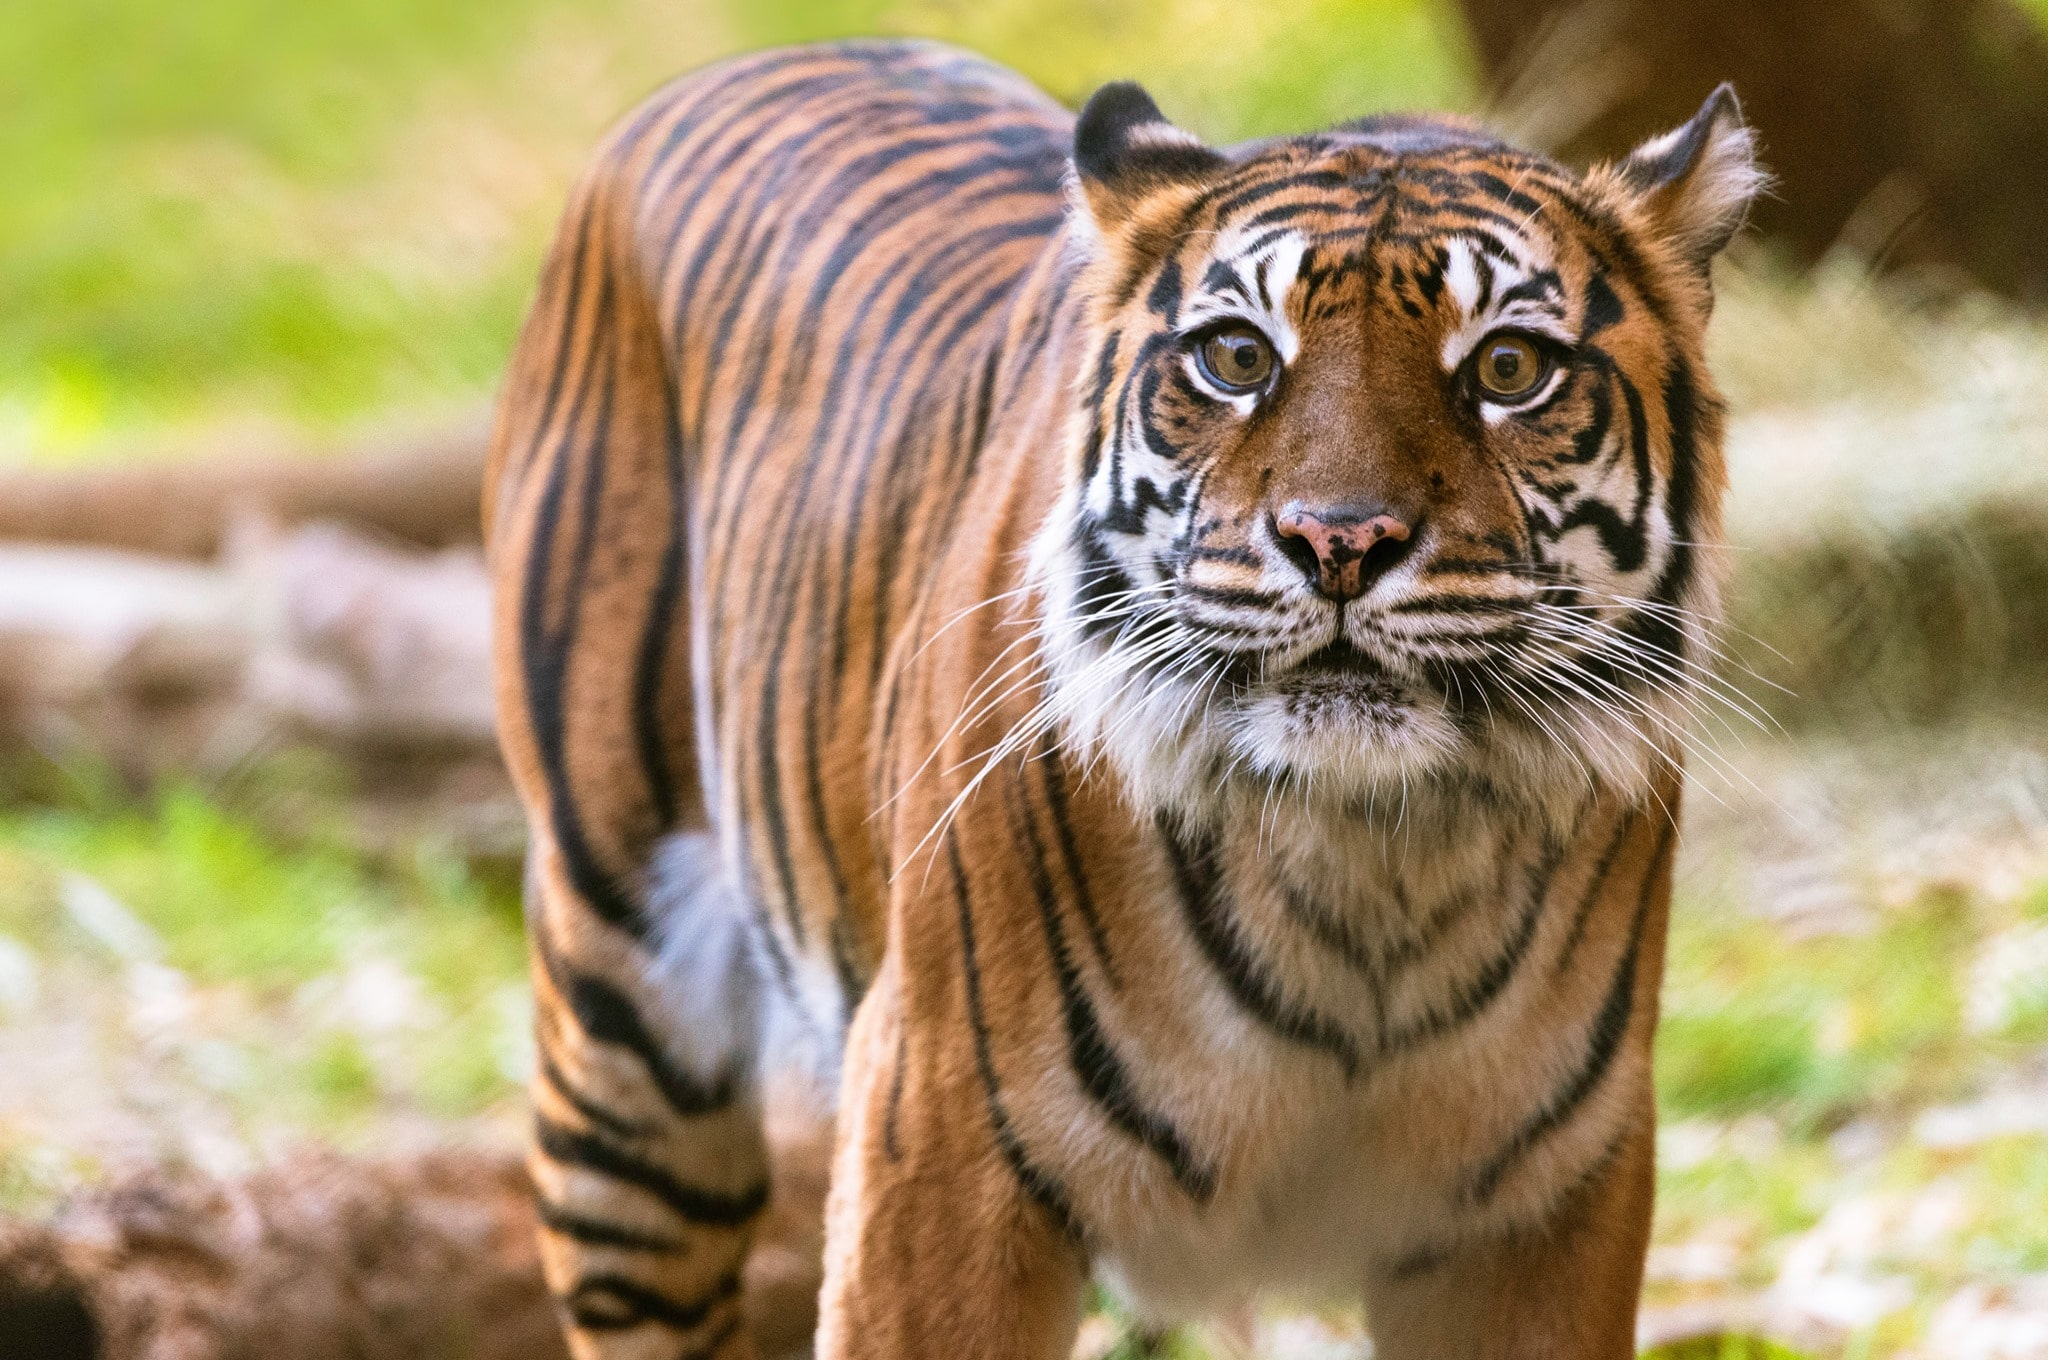 Sumatran tiger Melati at Dallas Zoo